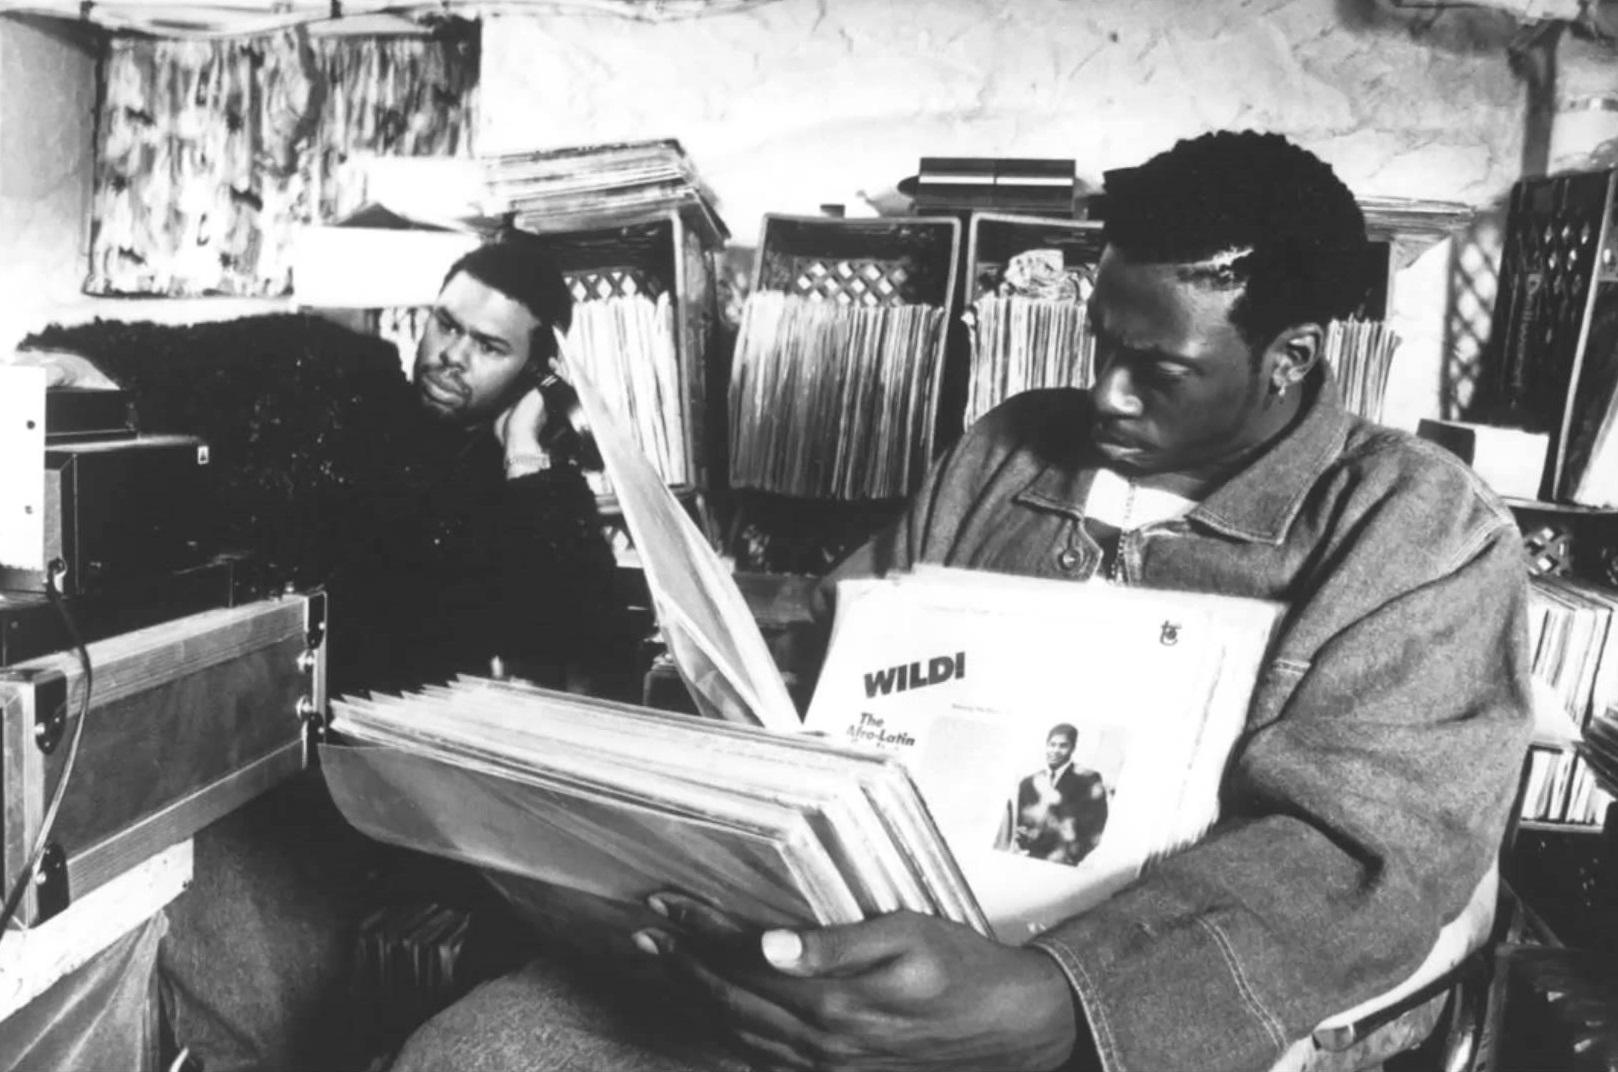 Whiskey, Fela Kuti, afery i najlepsze beaty Pete Rocka